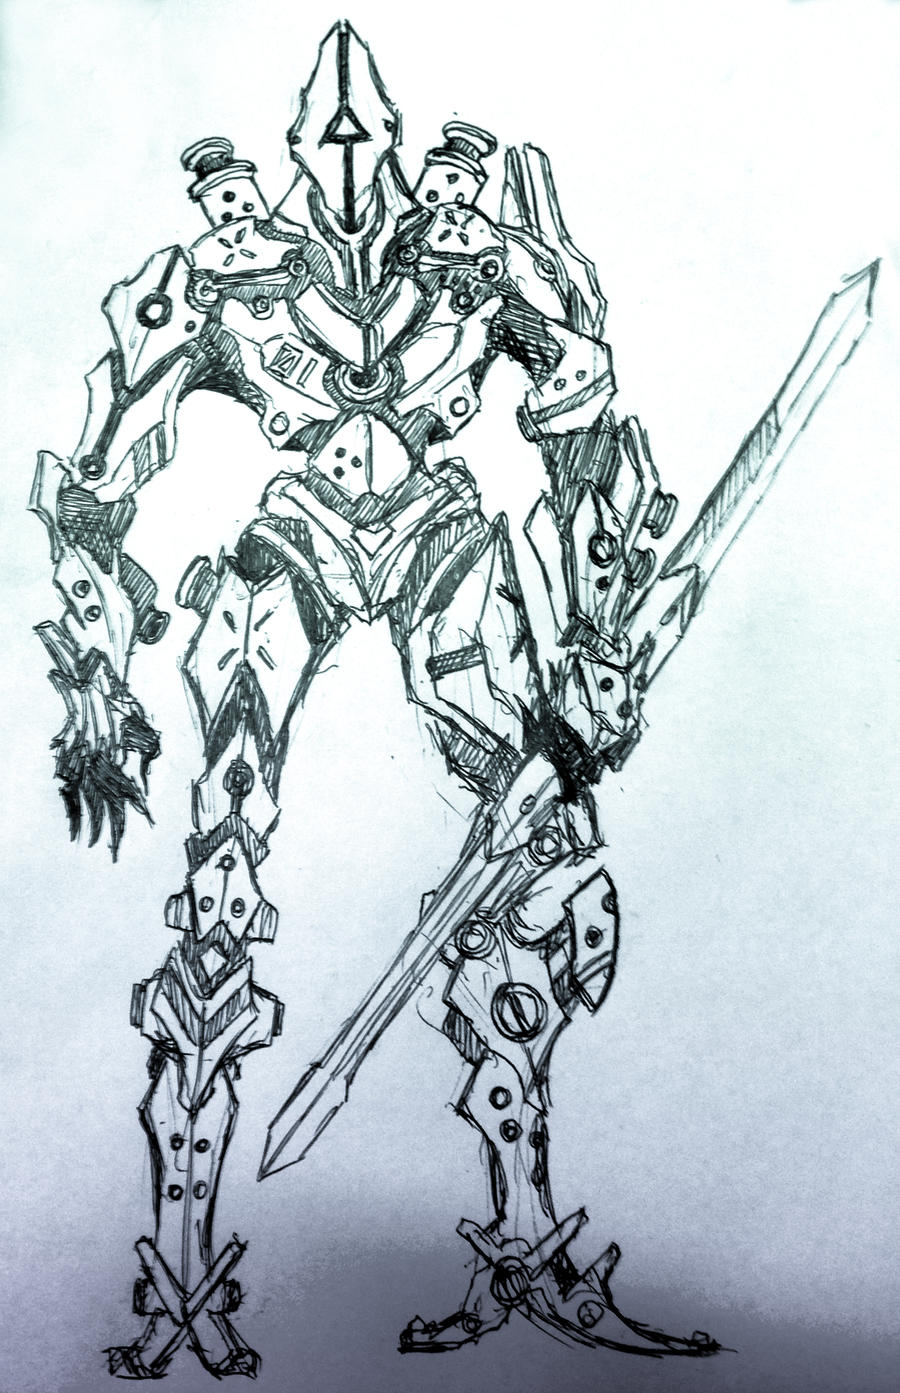 Sketch: 01 - Demigod by HostileSynth